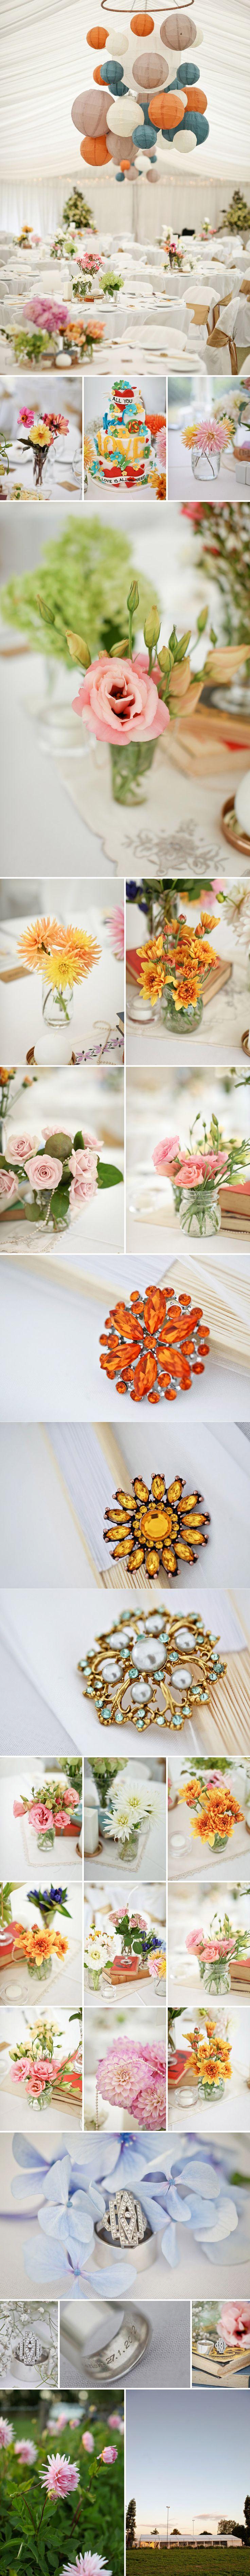 307 best Wedding Stuff images on Pinterest | Wedding stuff, Diy ...